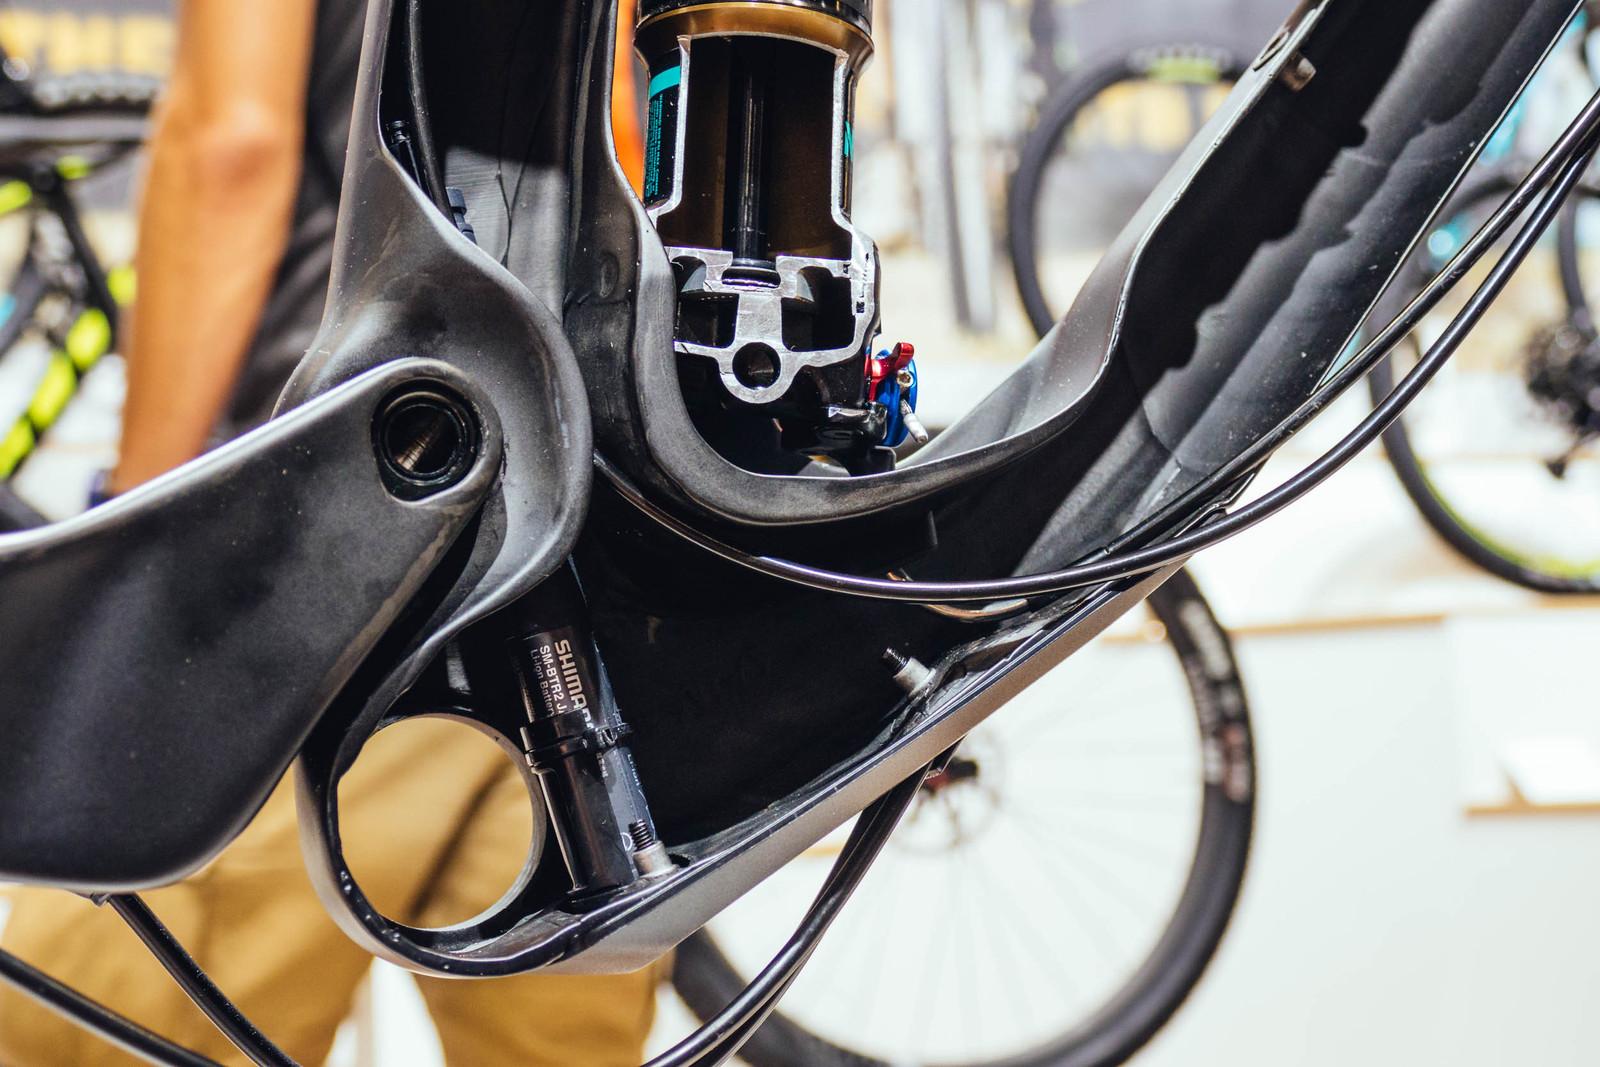 What\'s Inside the Scott Genius Carbon Frame? - Mountain Bikes ...